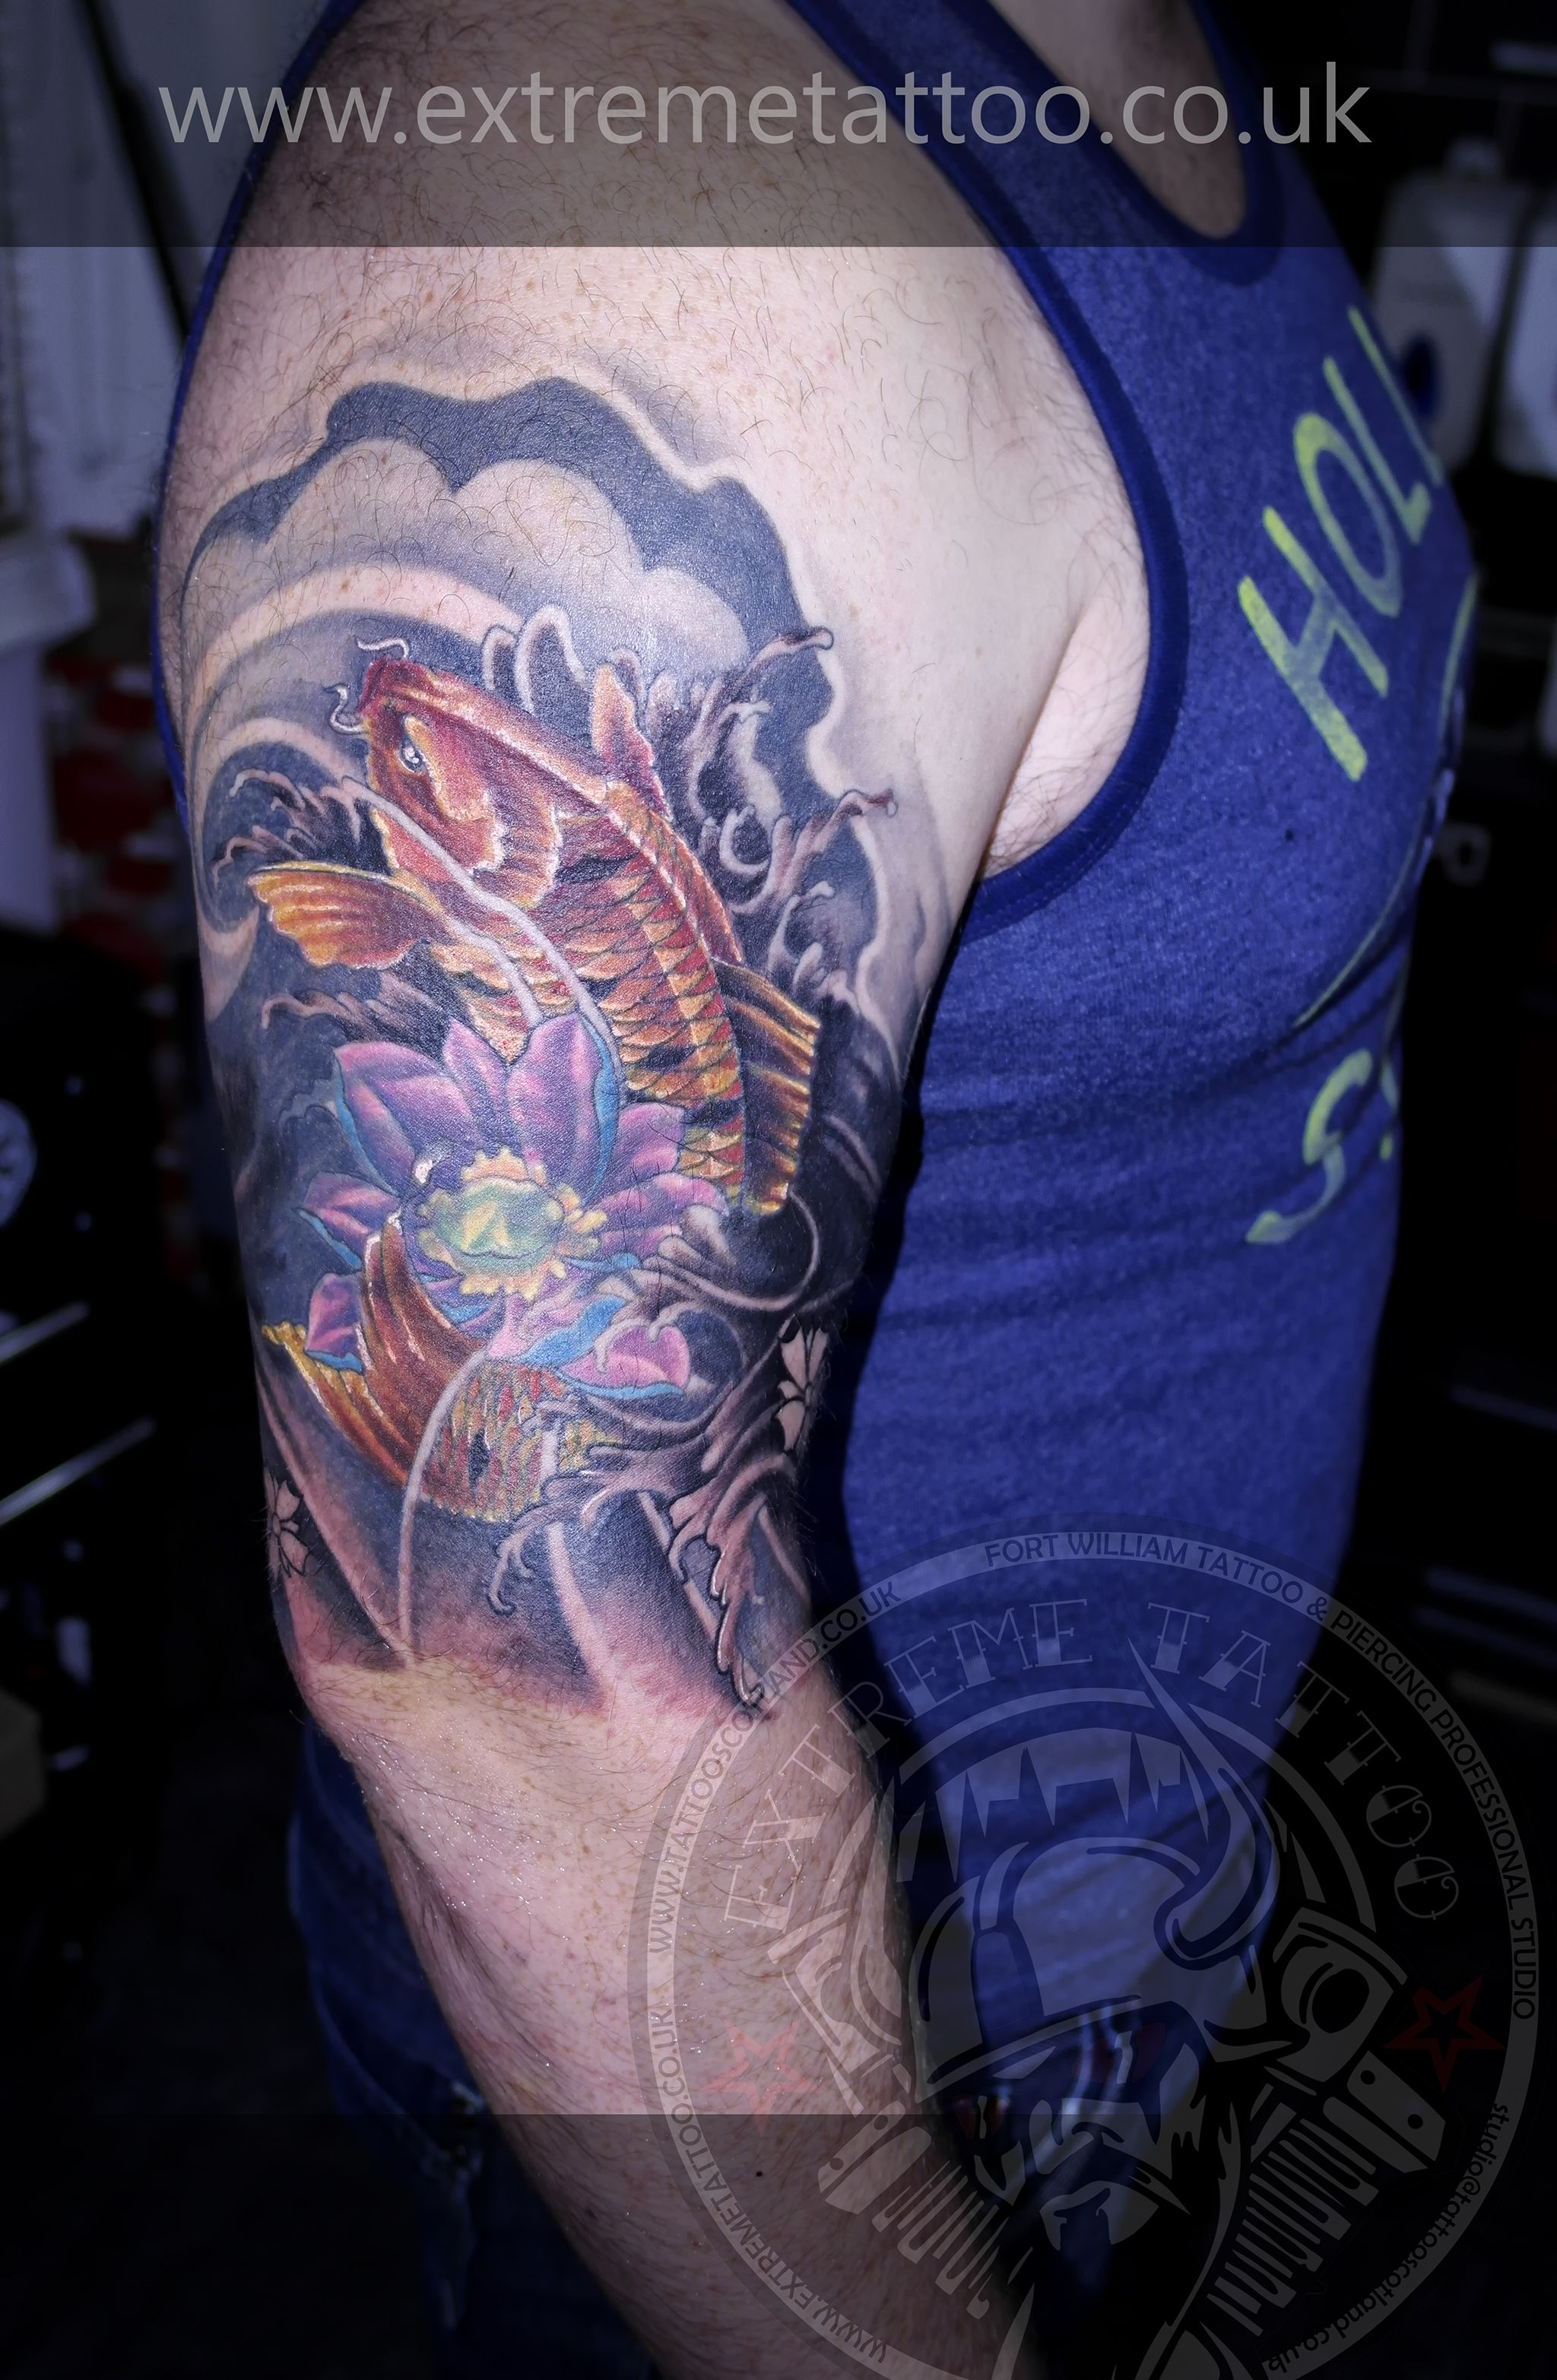 Koi fish tattoolotus flower tattoo sleeve in progresscover upgabi koi fish tattoolotus flower tattoo sleeve in progresscover upgabi tomescu izmirmasajfo